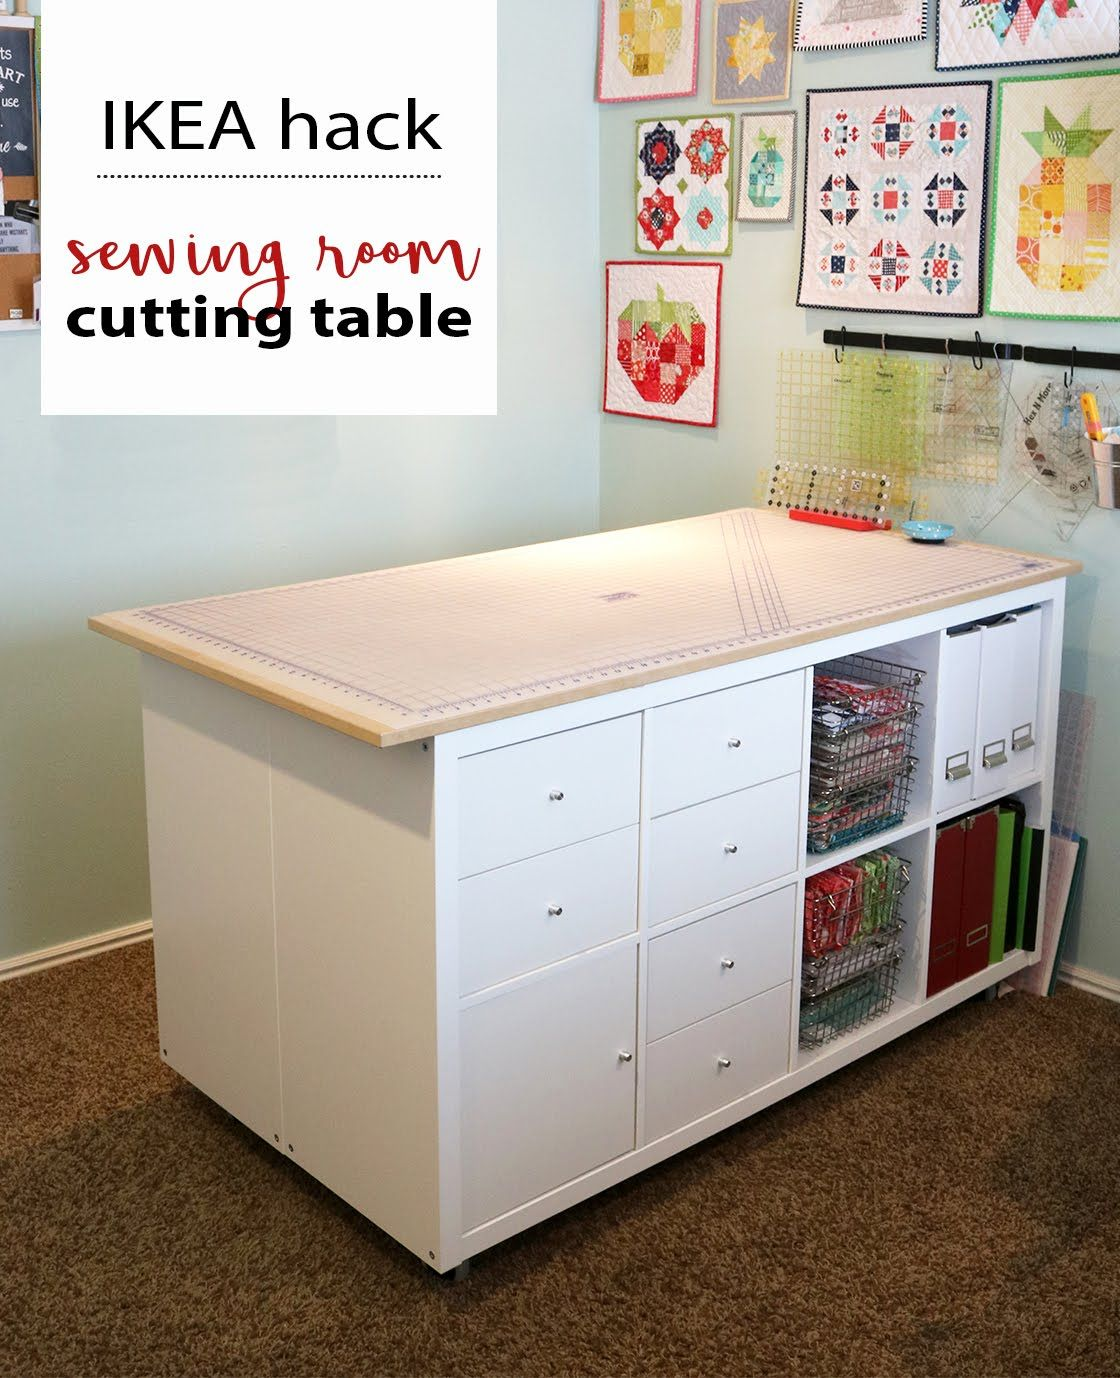 Diy ikea sewing table  DIY Sewing Room Cutting Table IKEA Hack  Cutting tables Sewing